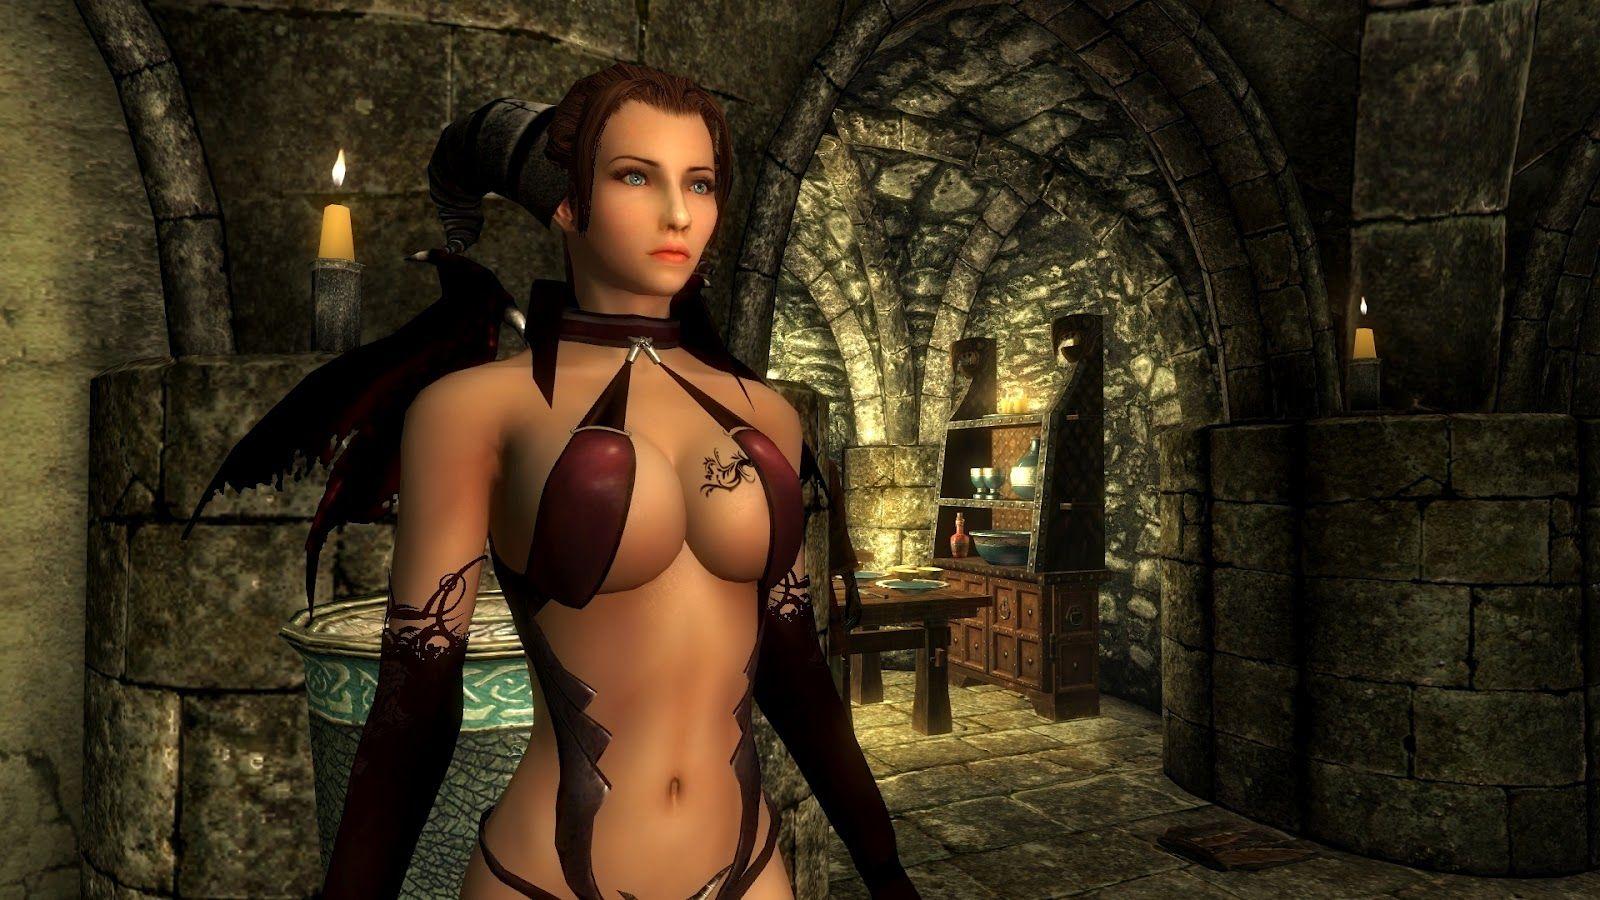 skyrim sexy outfit